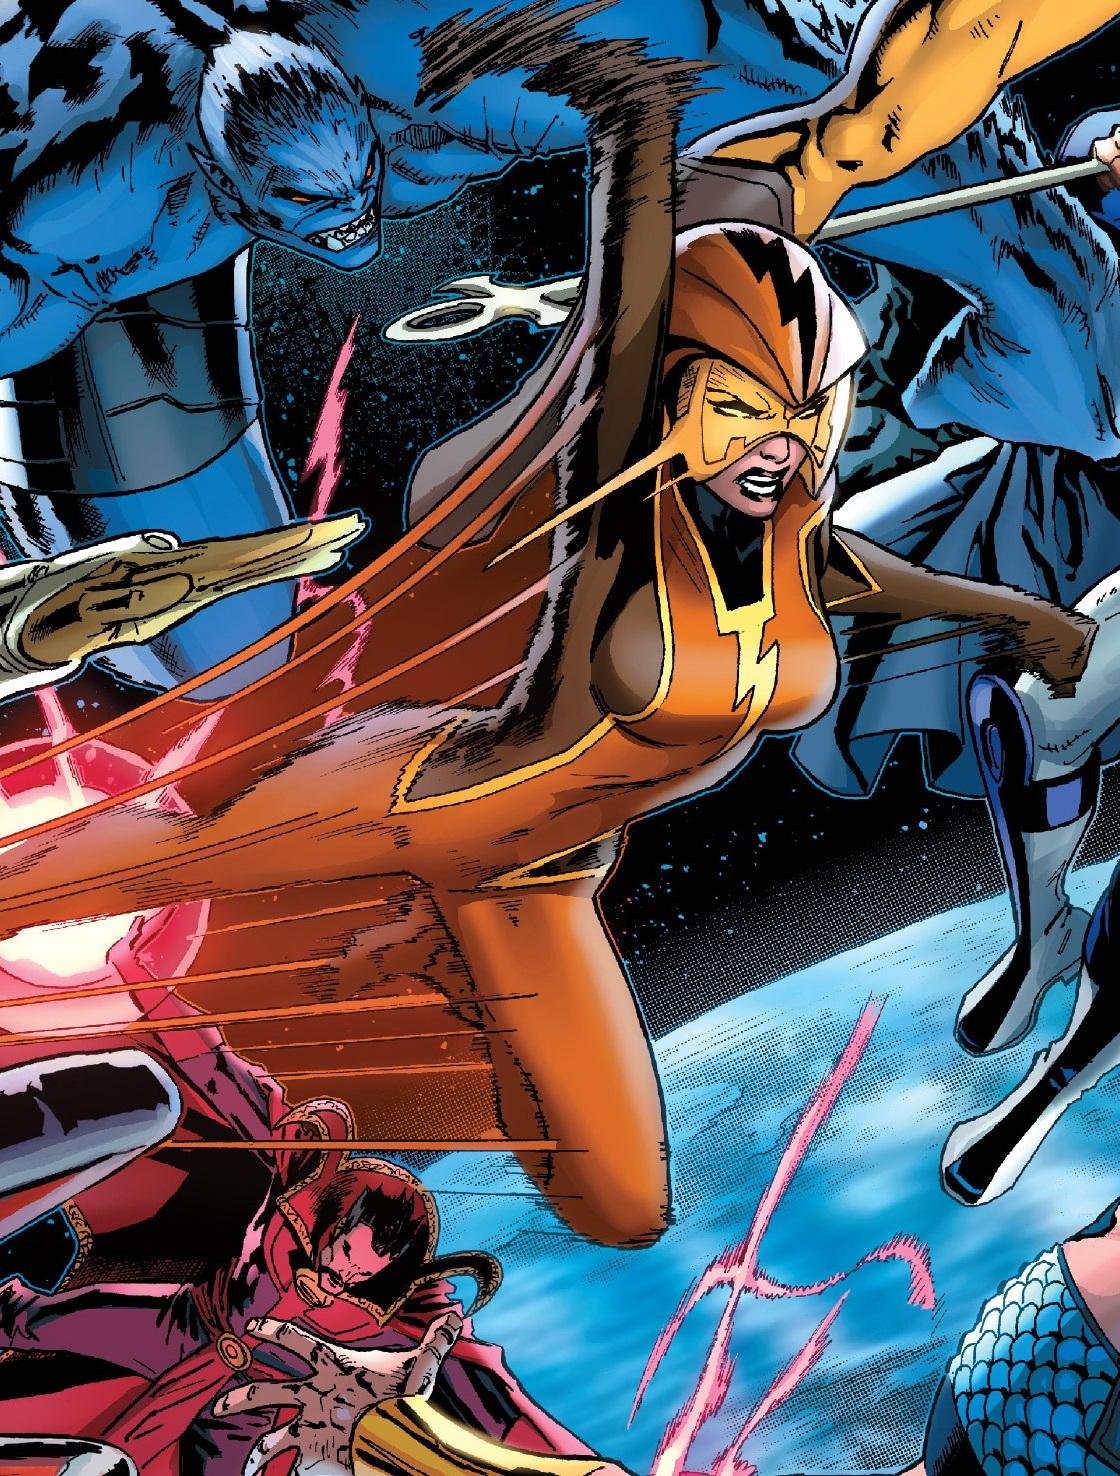 Vol 3 New Avengers #19